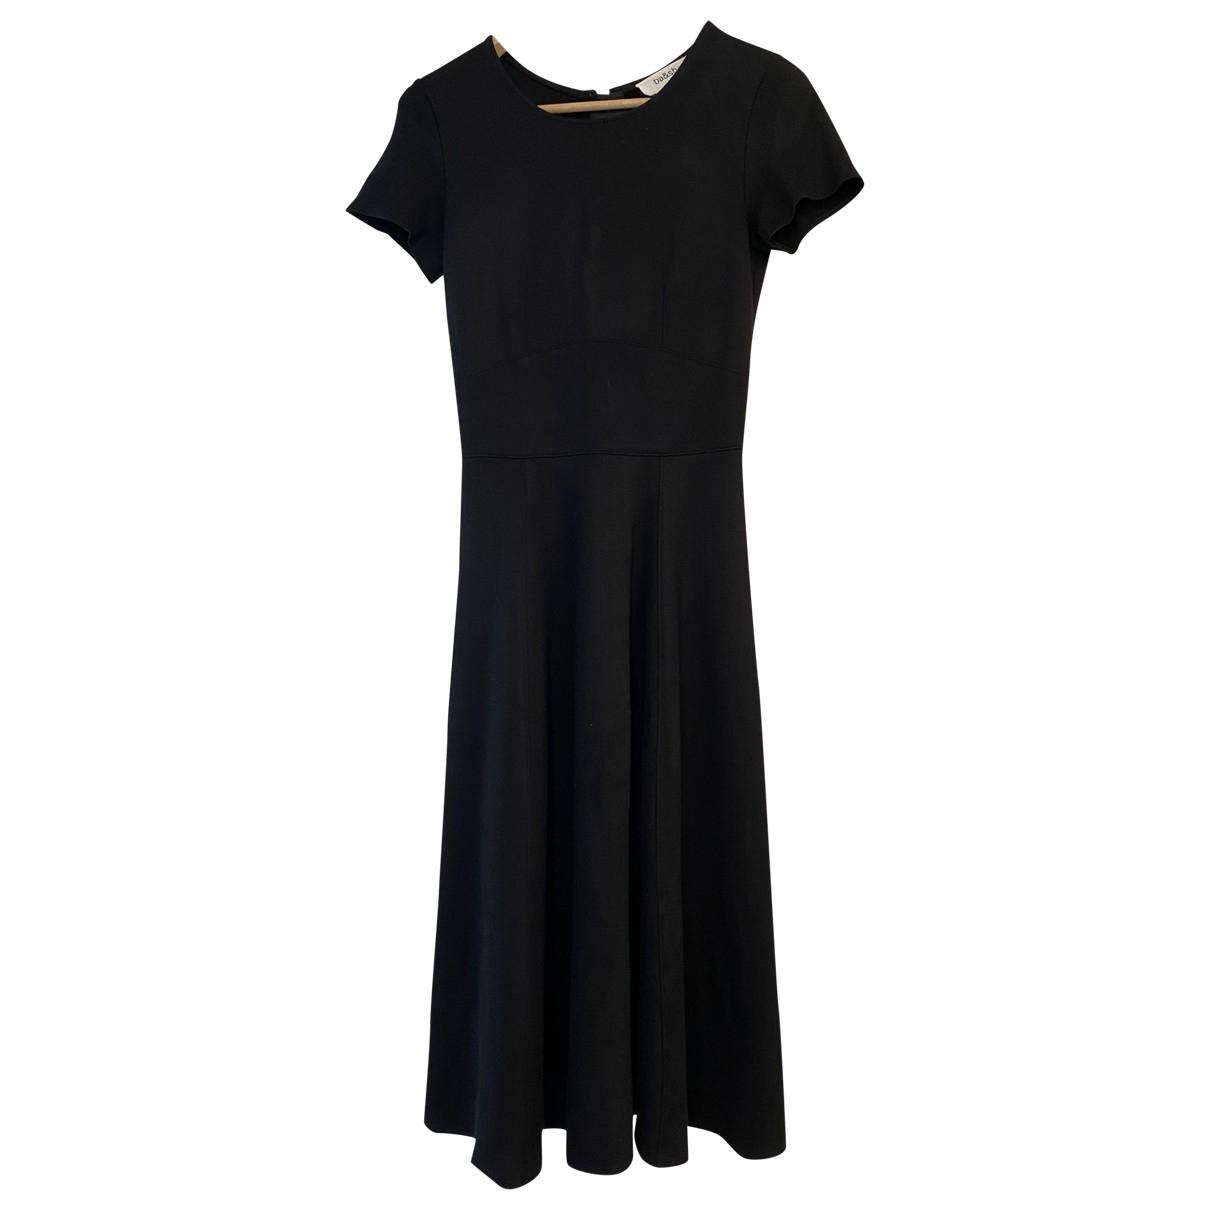 Ba&sh \N Black dress for Women 0 0-5